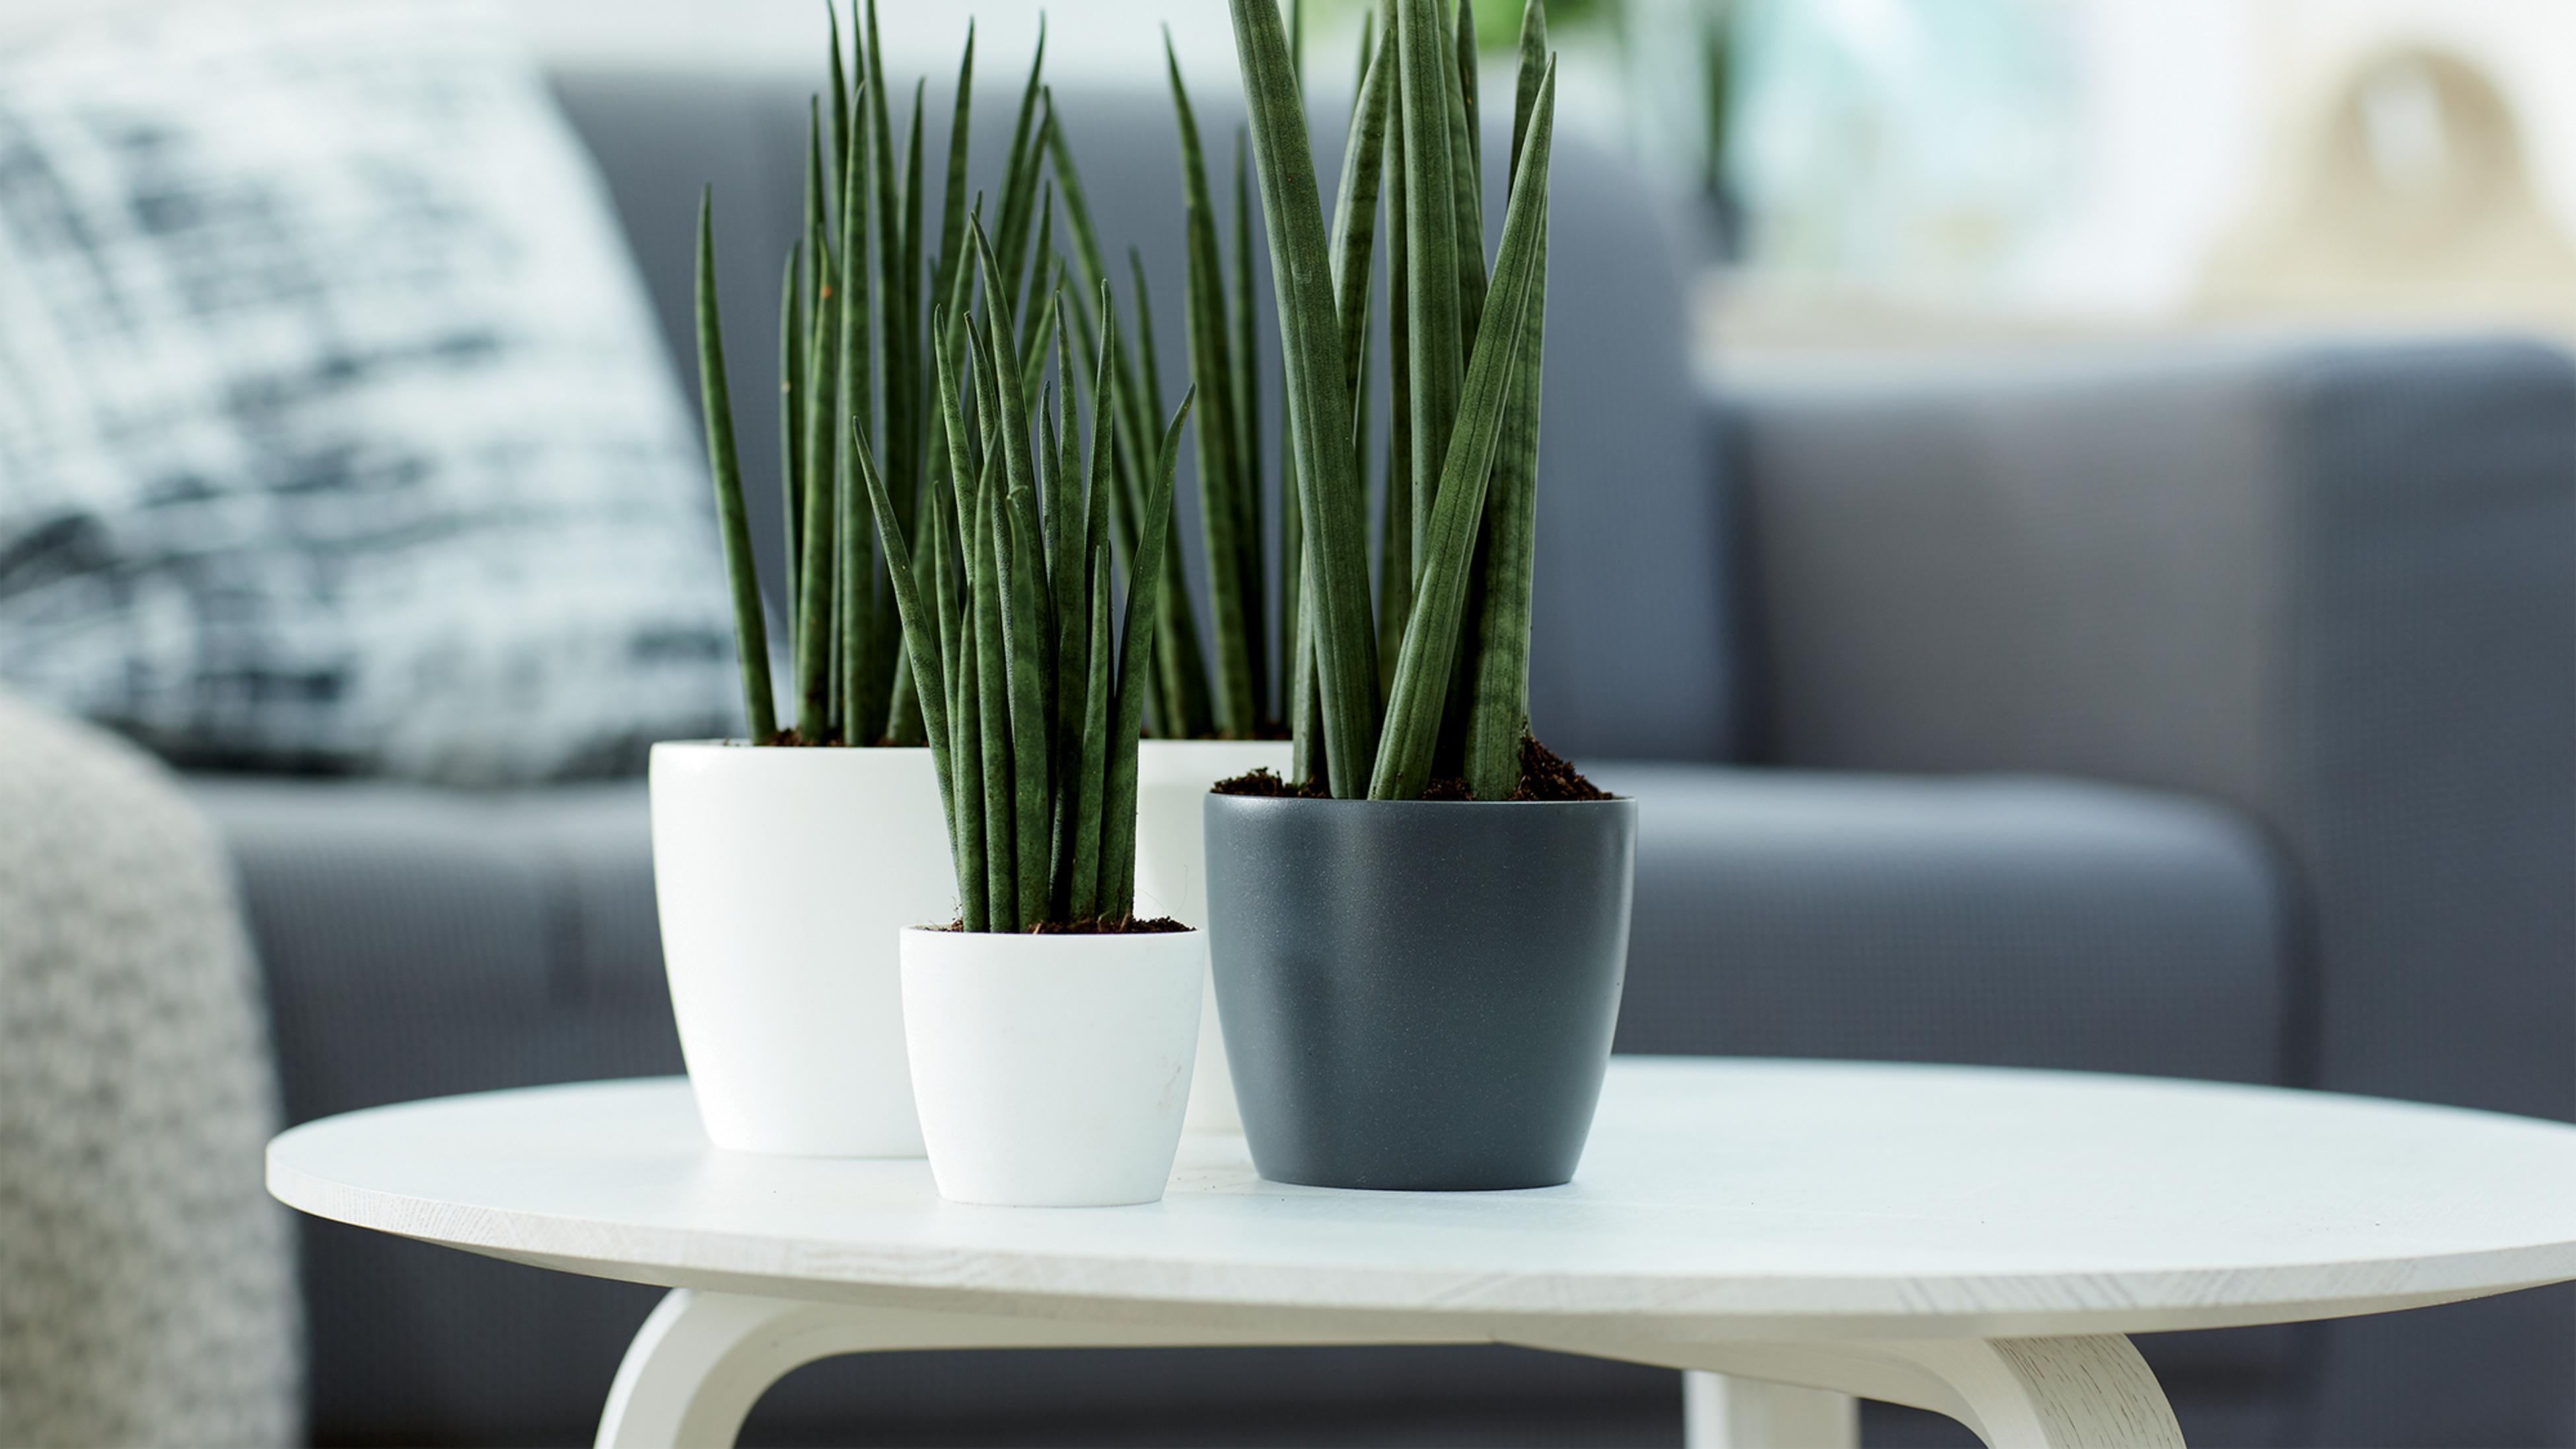 Sansevieria plant sitting on coffee table.